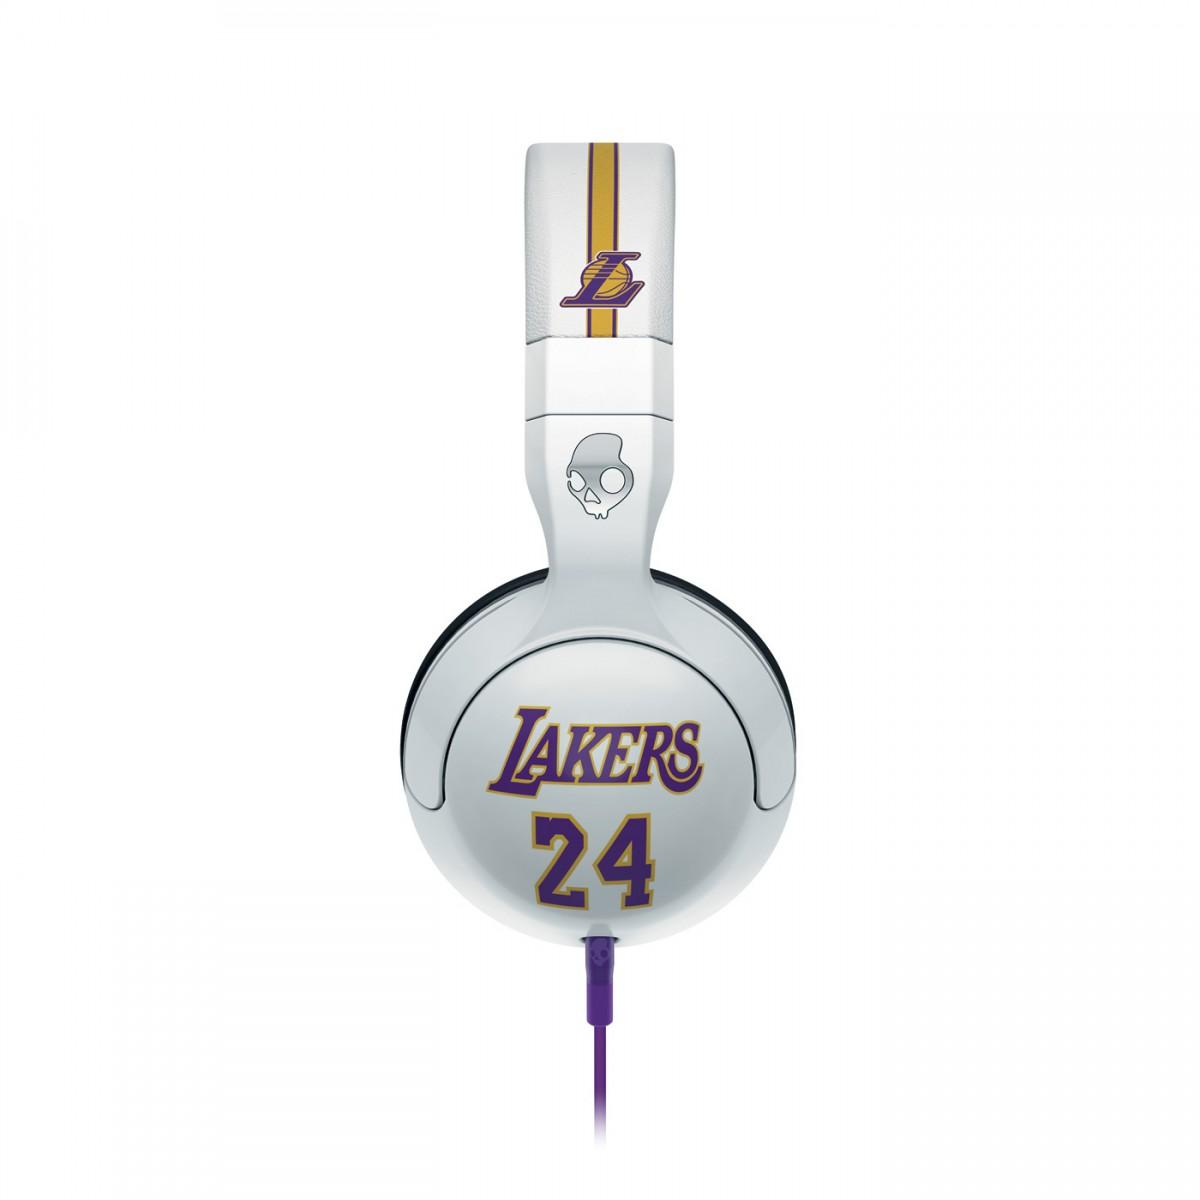 Fone de Ouvido com Microfone Hesh 2 Los Angeles Lakers S6HSDY-226 - Skullcandy